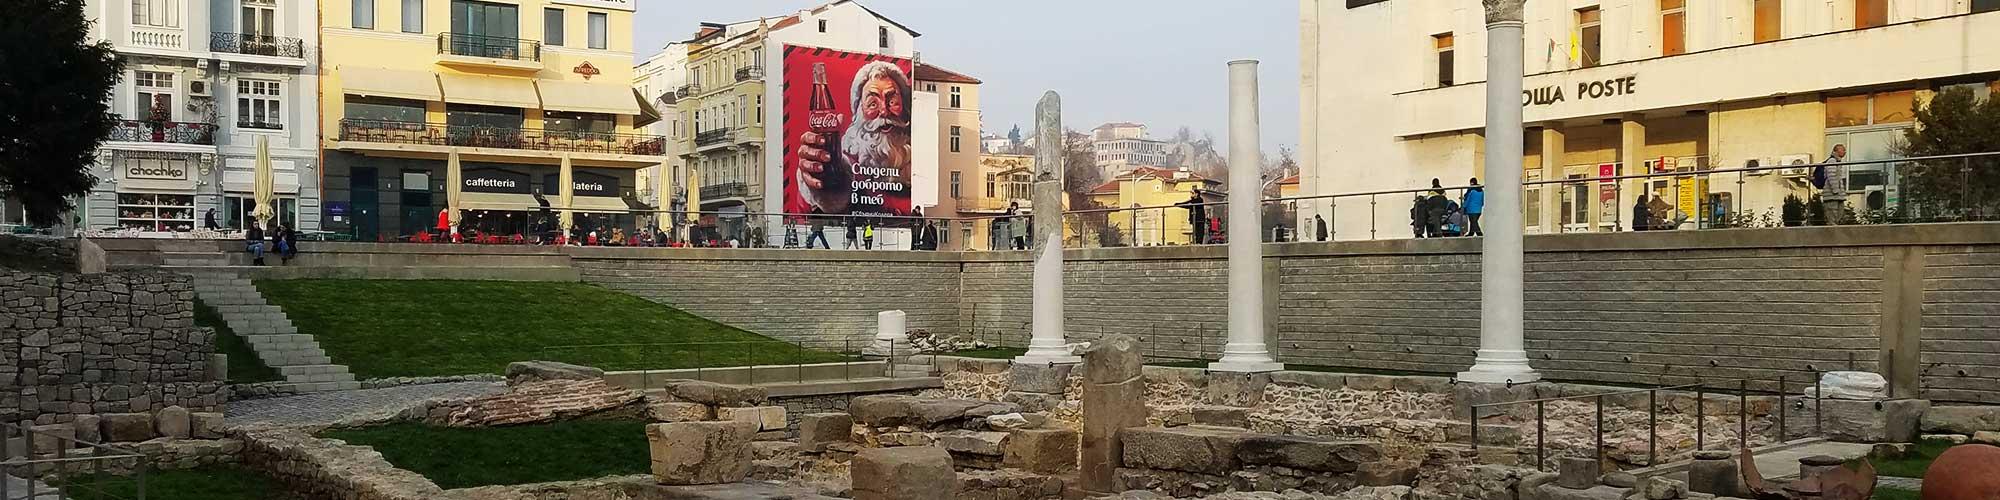 Plodding Around Plovdiv